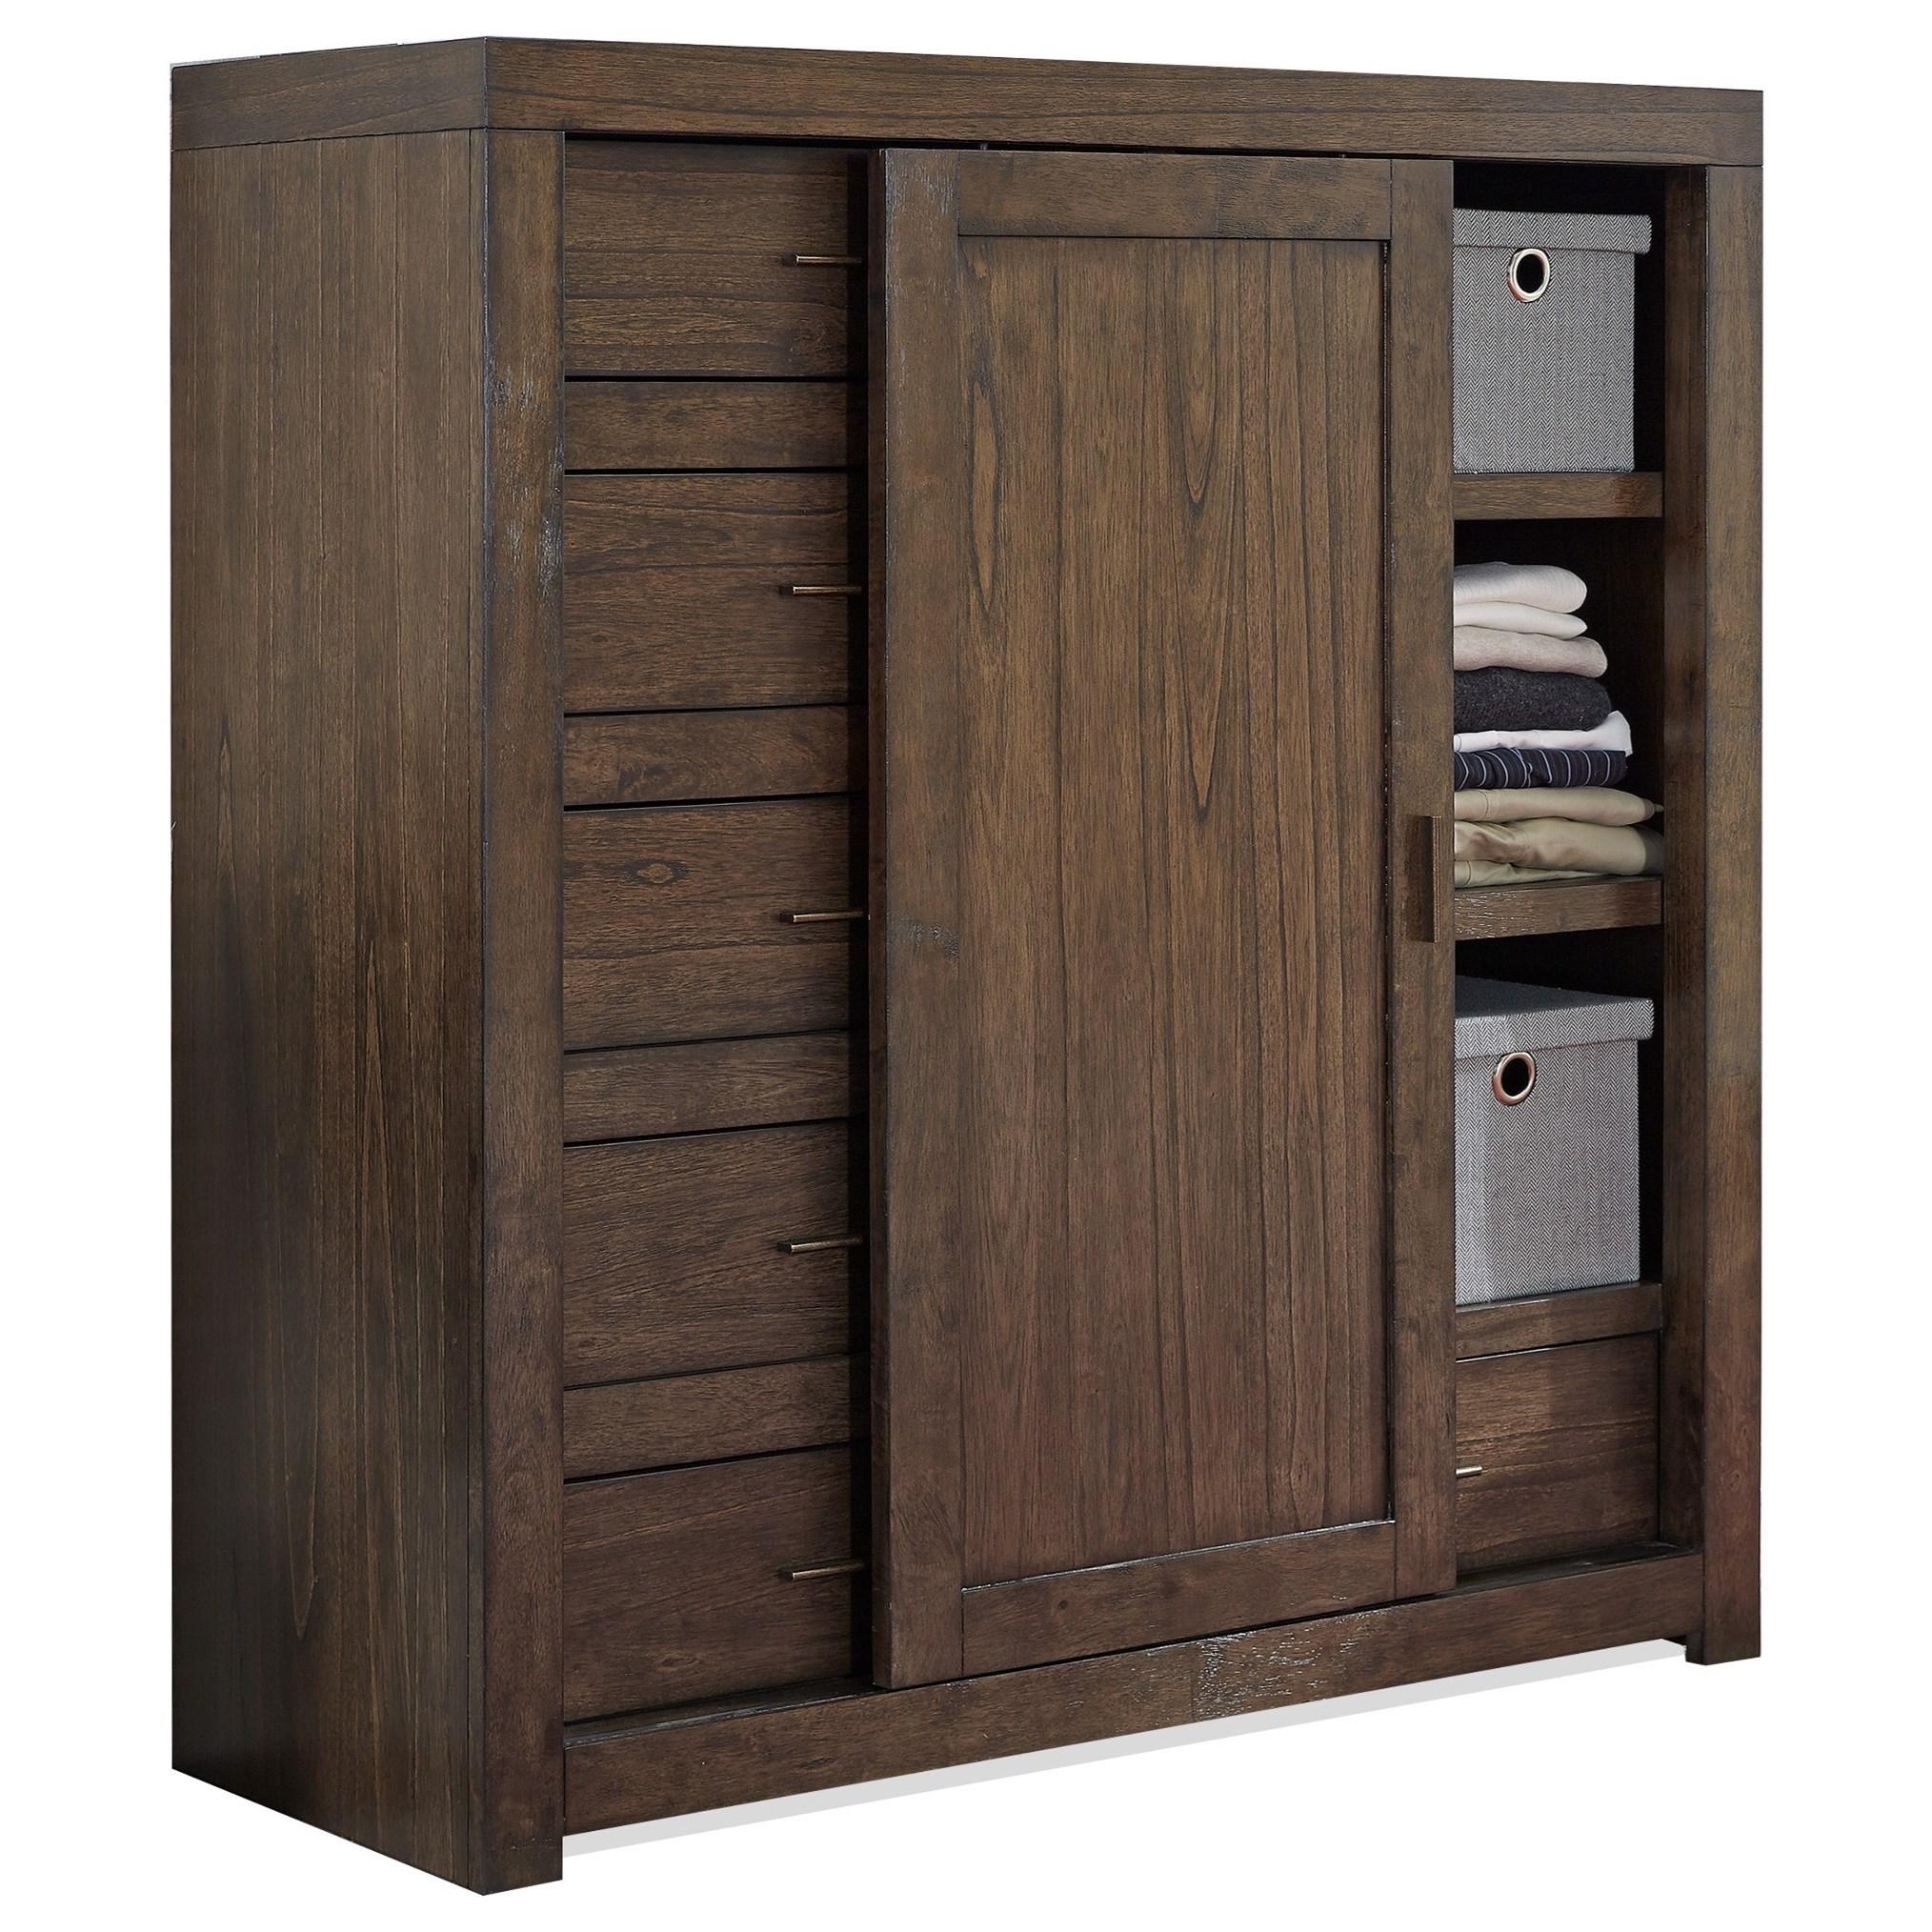 Modern Loft Sliding Door Chest by Aspenhome at Walker's Furniture